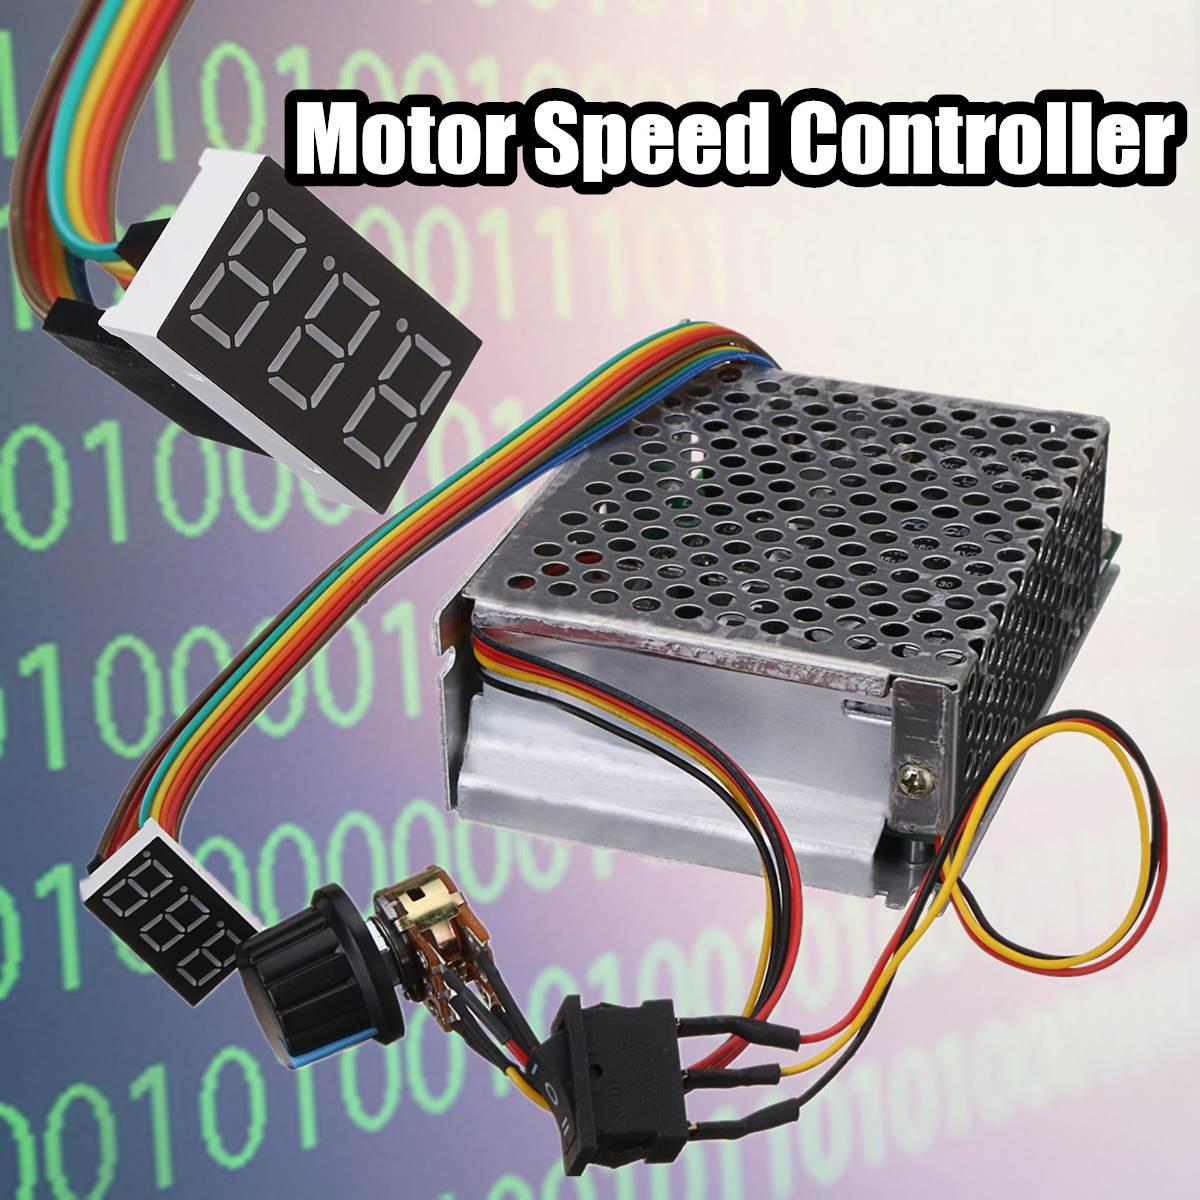 все цены на 1Pcs Reversible DC Motor Speed Controller DC10-50V 60A PWM Control 12V 24V 36V 48V Forward-Stop-Reversal Brake Digital Display онлайн